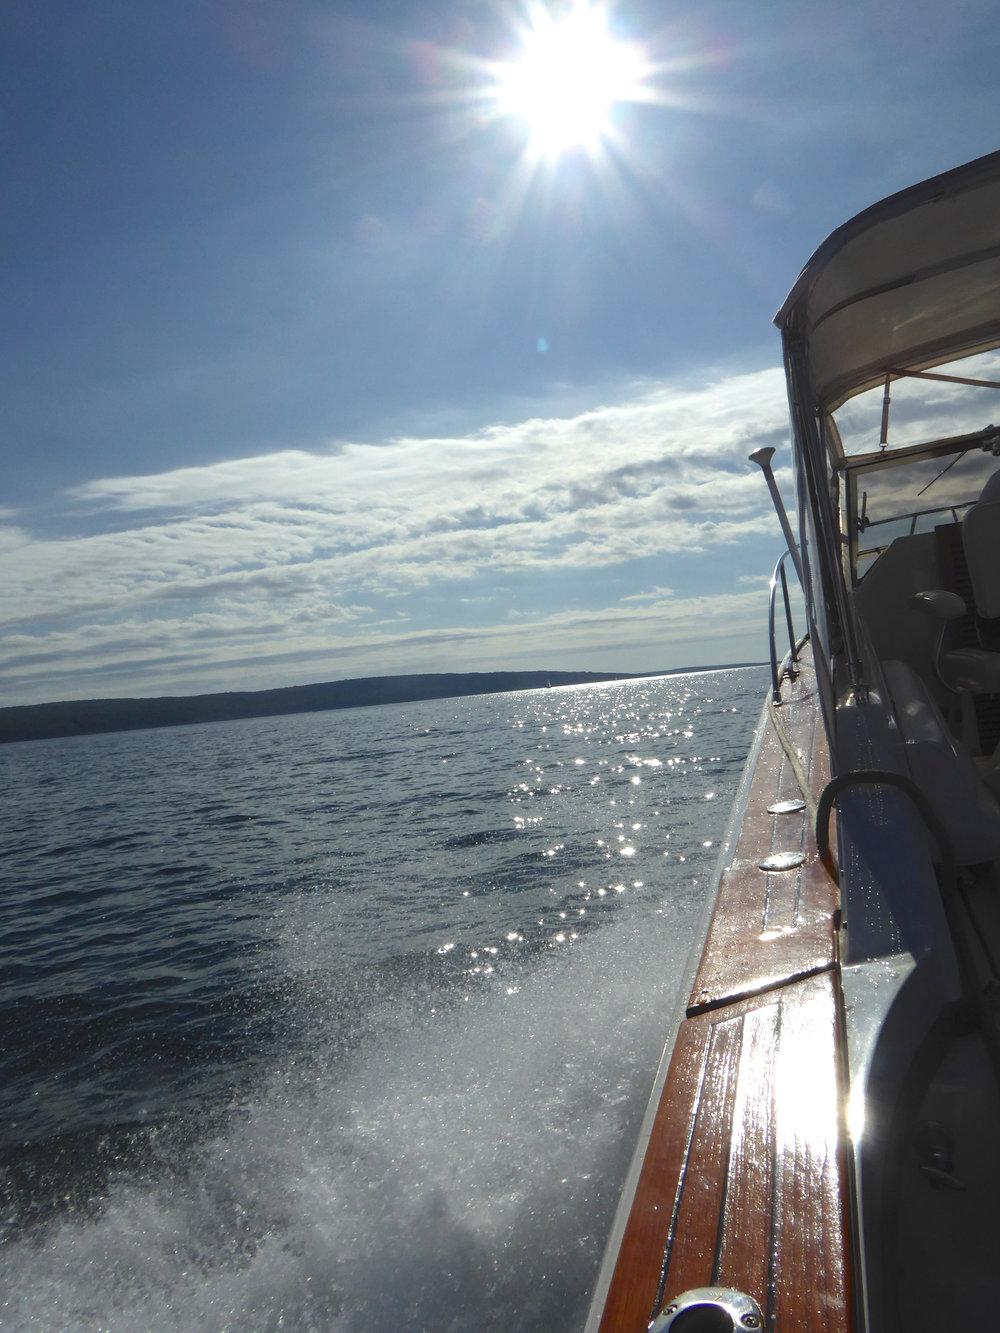 cindi_madelineisland_boating_spiritedtable_photo1.jpg